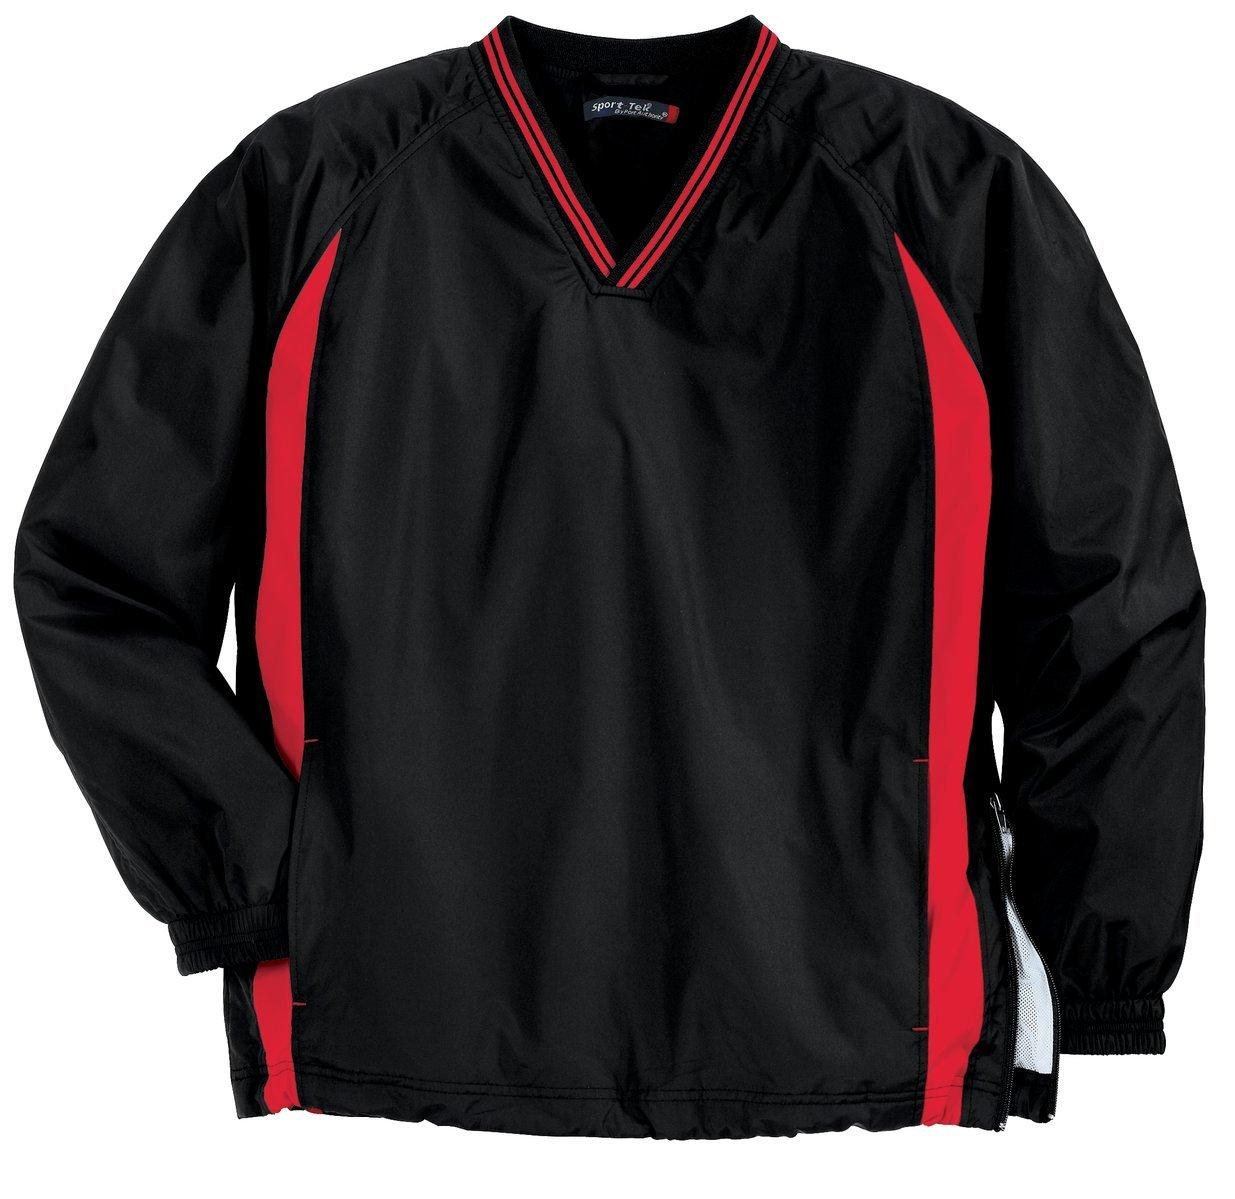 Sport - TekメンズTall Tipped Vネックラグラン風シャツ B00PCRHW98 4L Black/Tr Red Black/Tr Red 4L